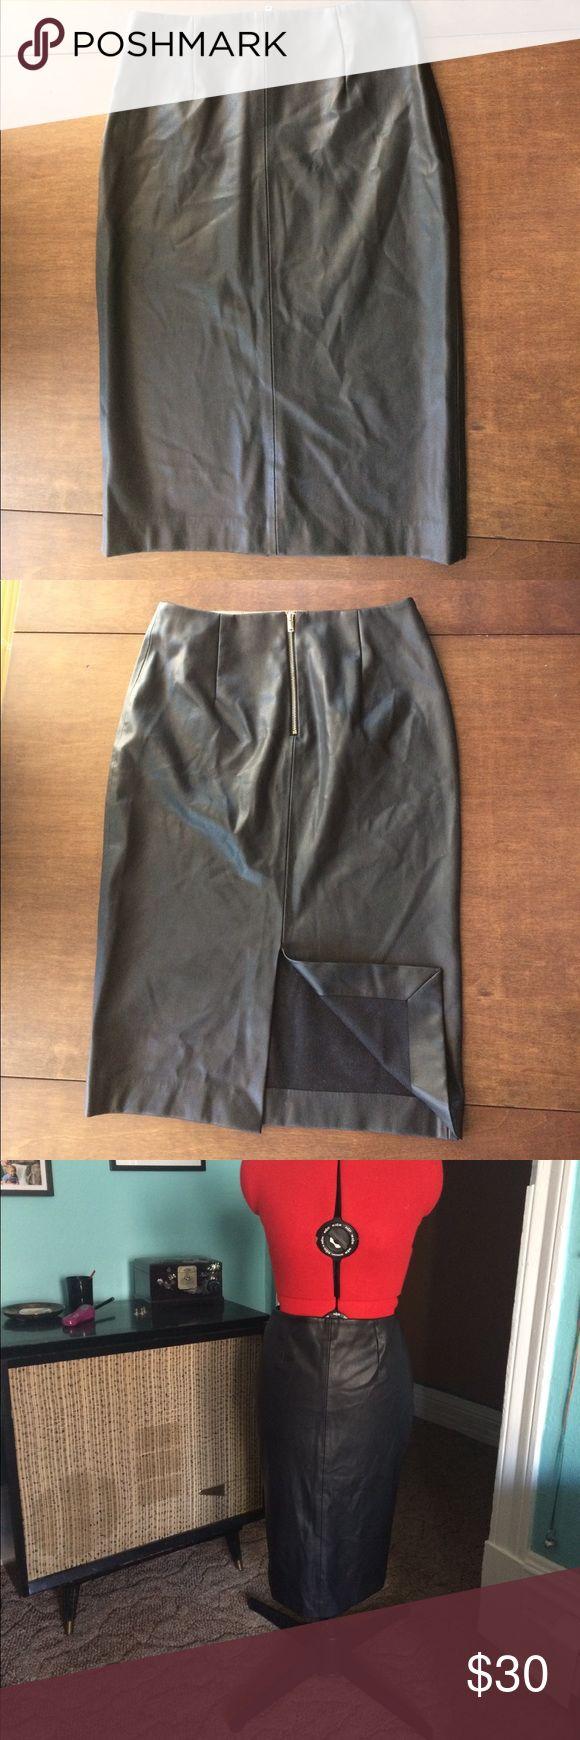 "⚫️Zara Faux Leather pencil Skirt Faux Leather Pencil Skirt, soft and leather has stretch. Waist 14"" Hips 18"" Length 24"" Zara Skirts Pencil"